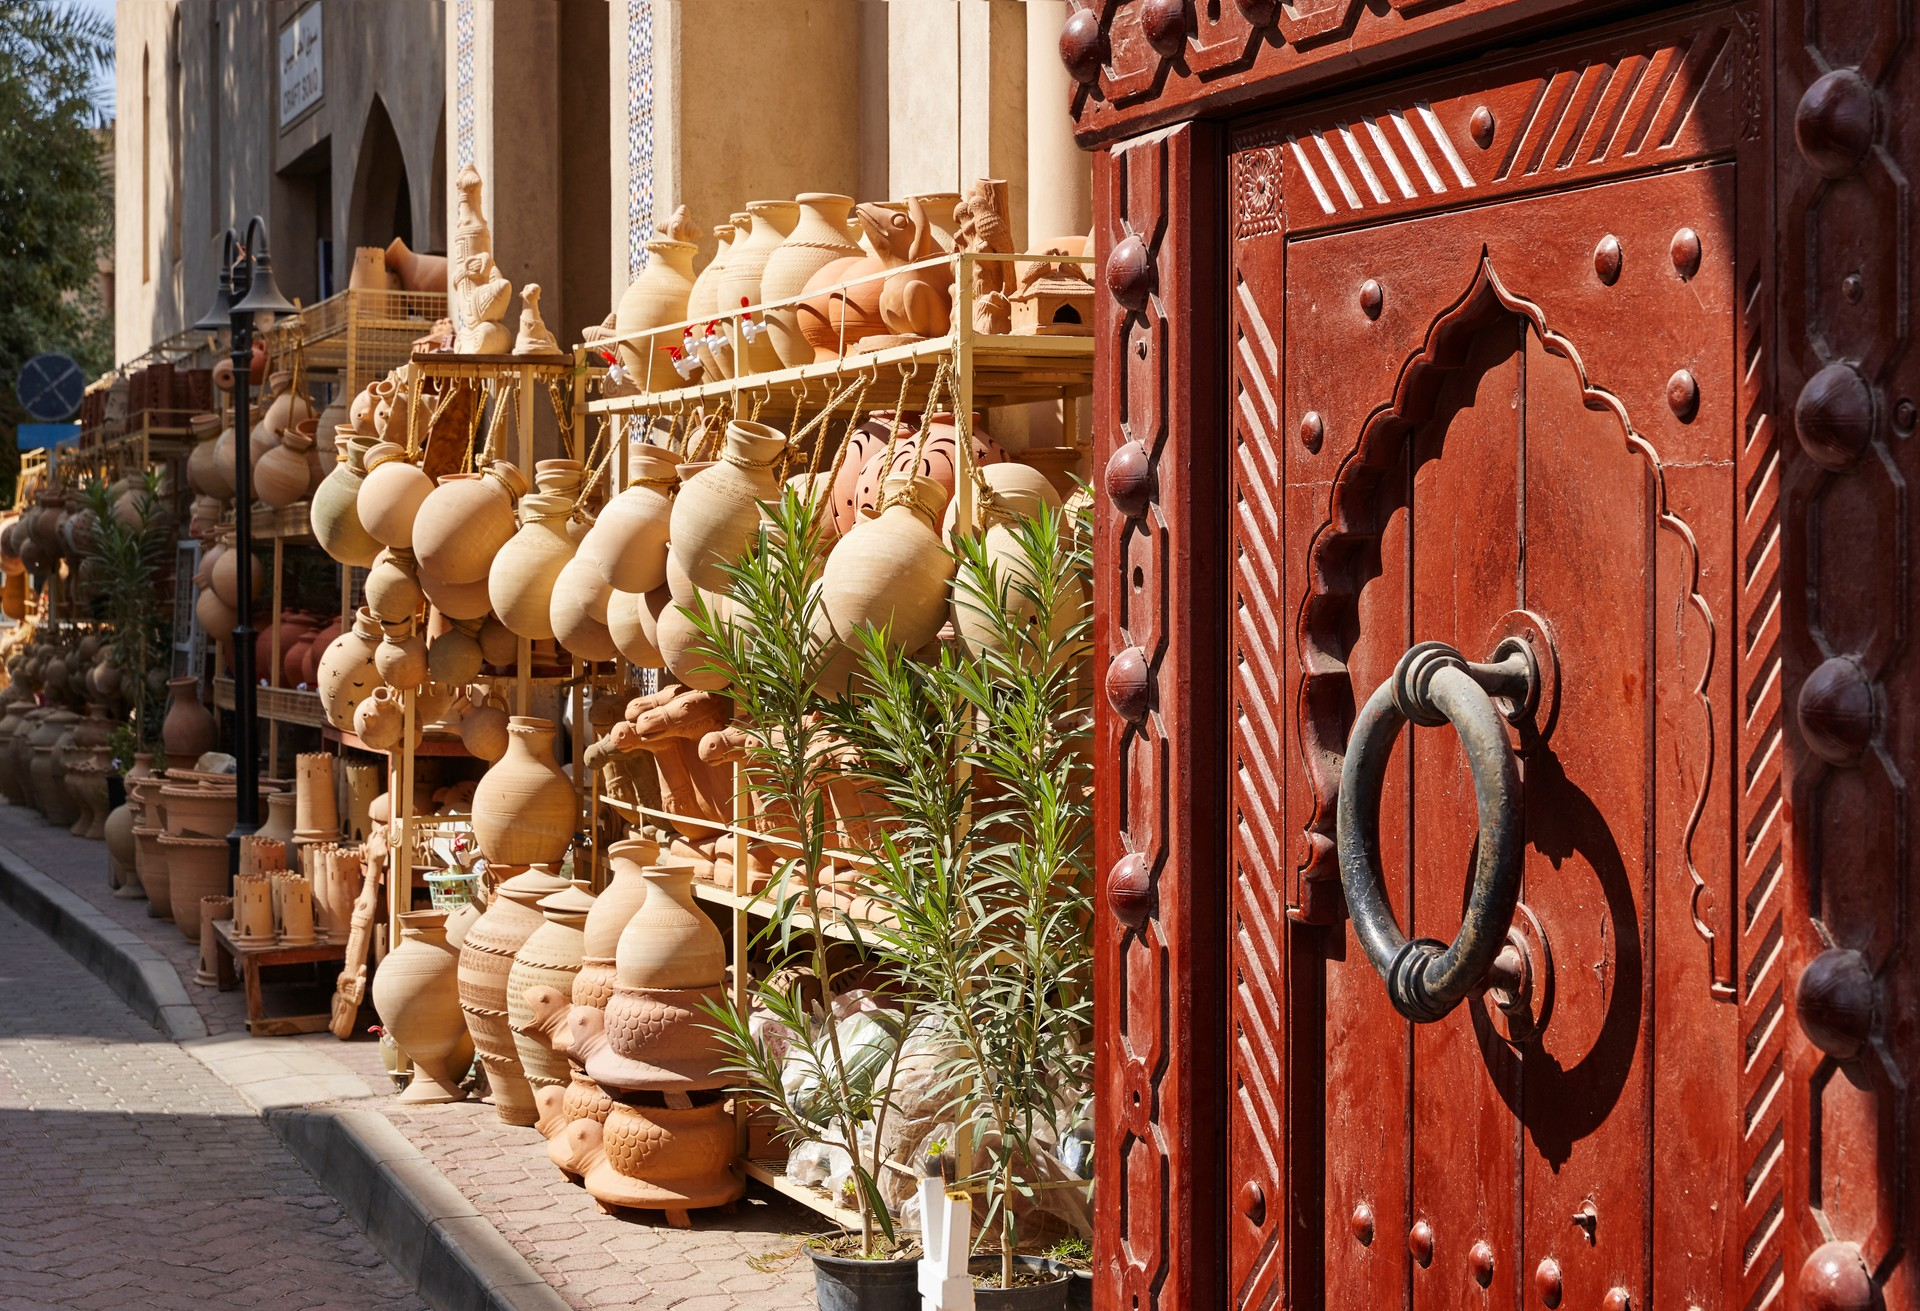 Market stall in Nizwa, Oman